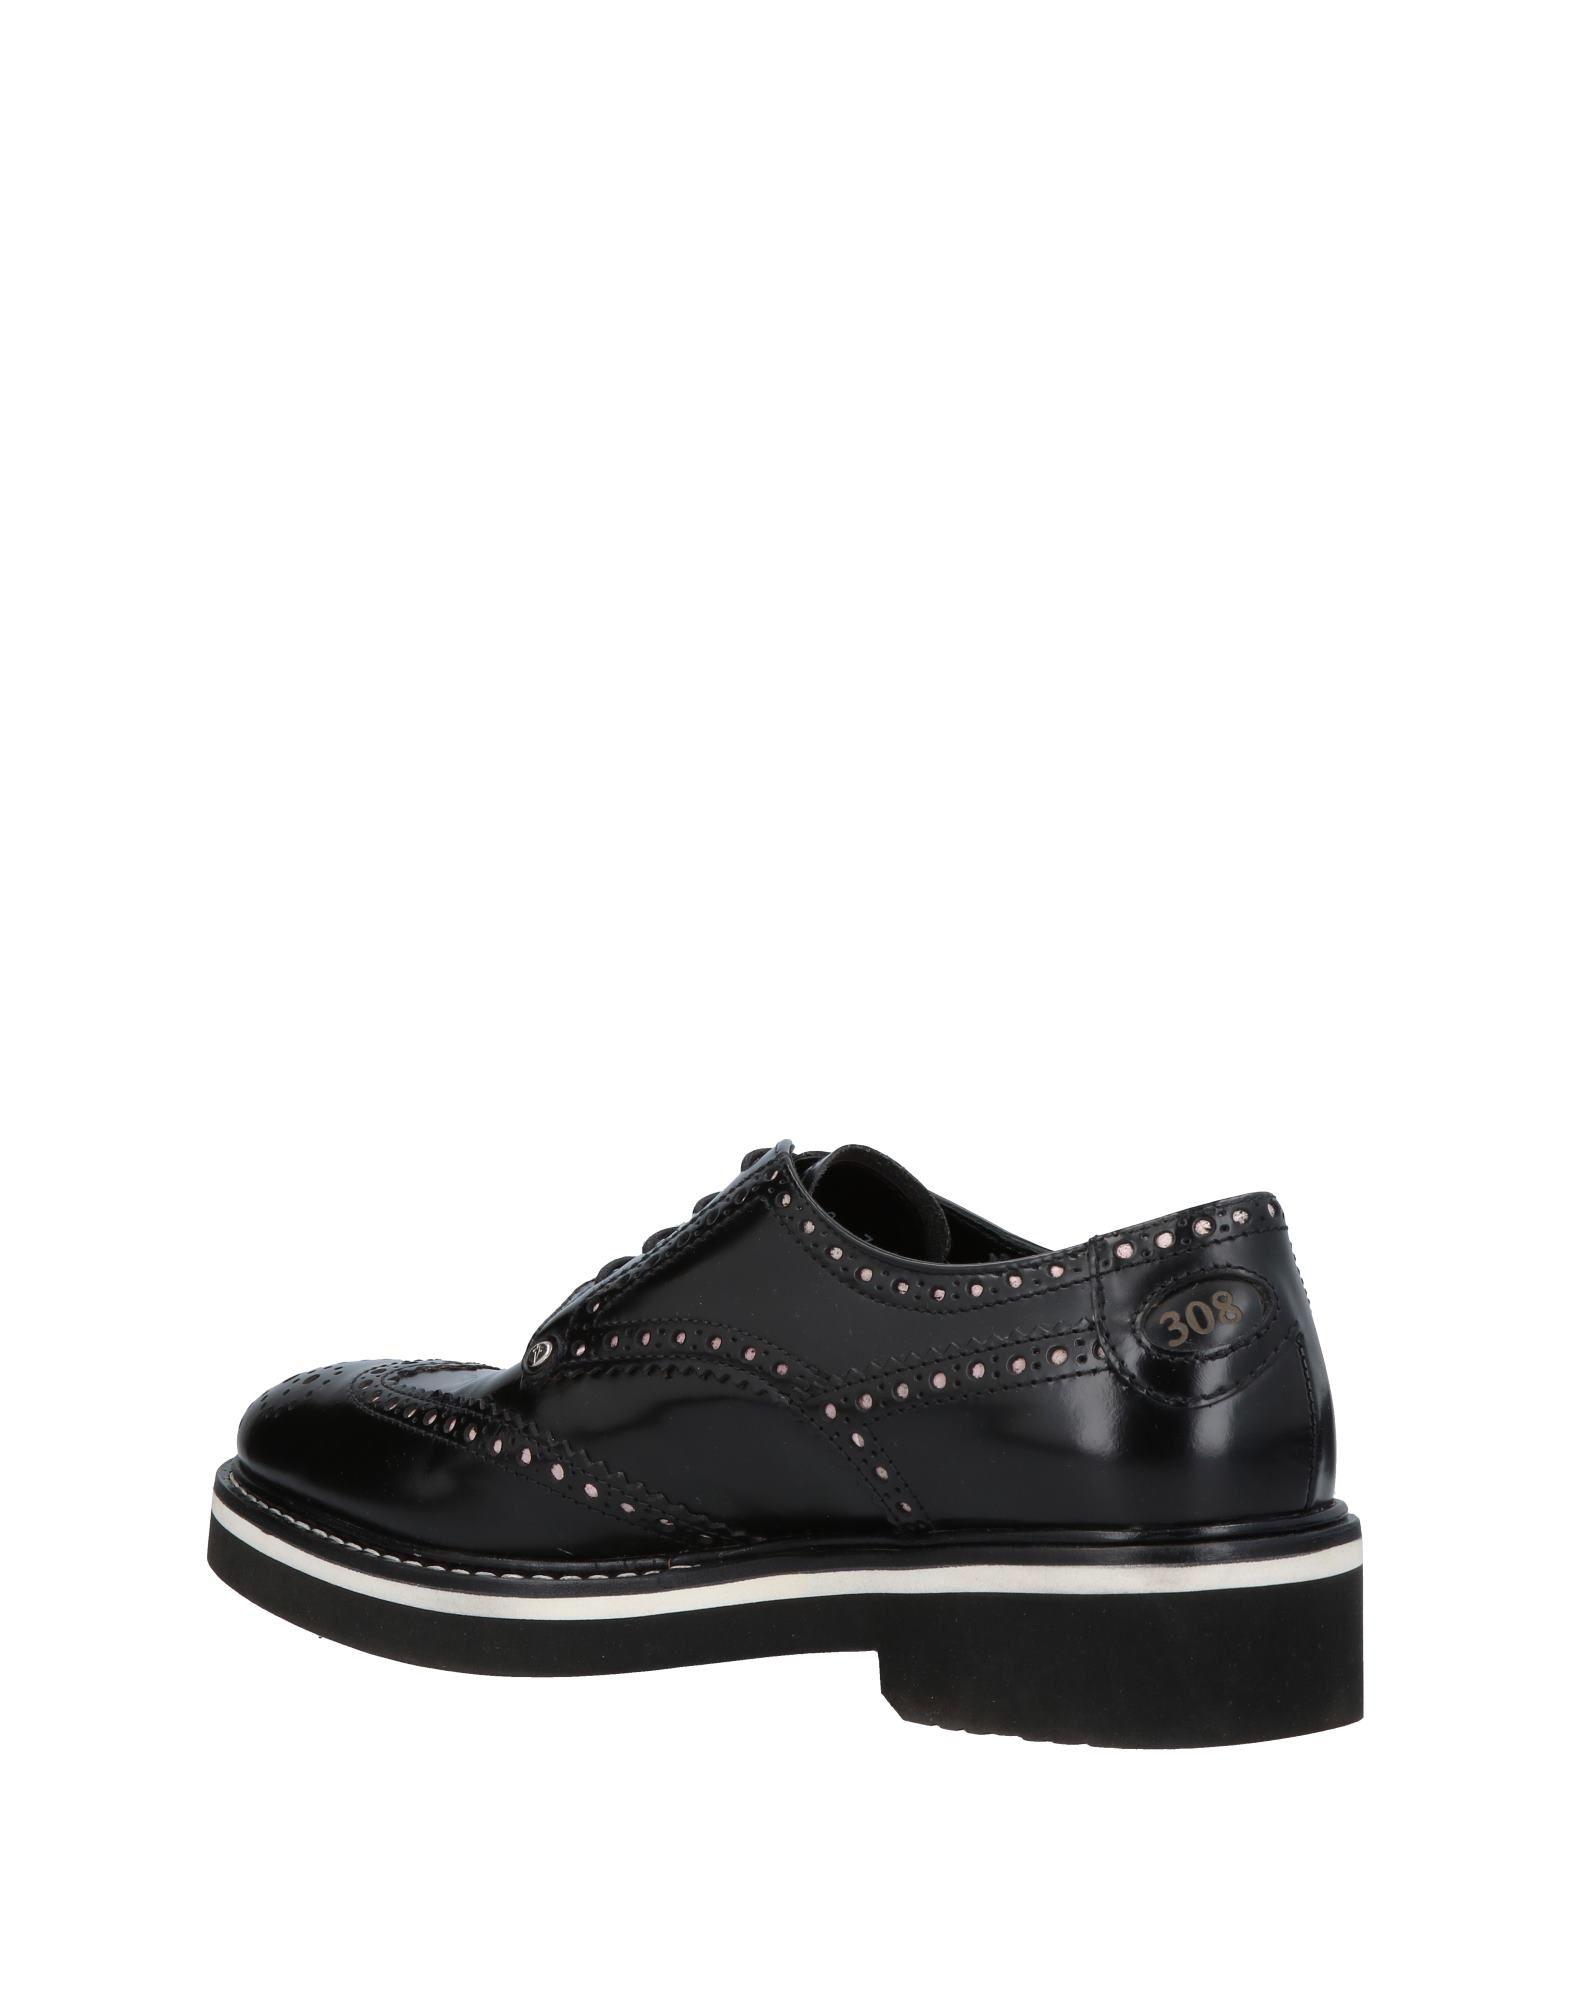 Rabatt echte Schuhe Schnürschuhe Paciotti 308 Madison Nyc Schnürschuhe Schuhe Herren  11387292SB 81b3d3